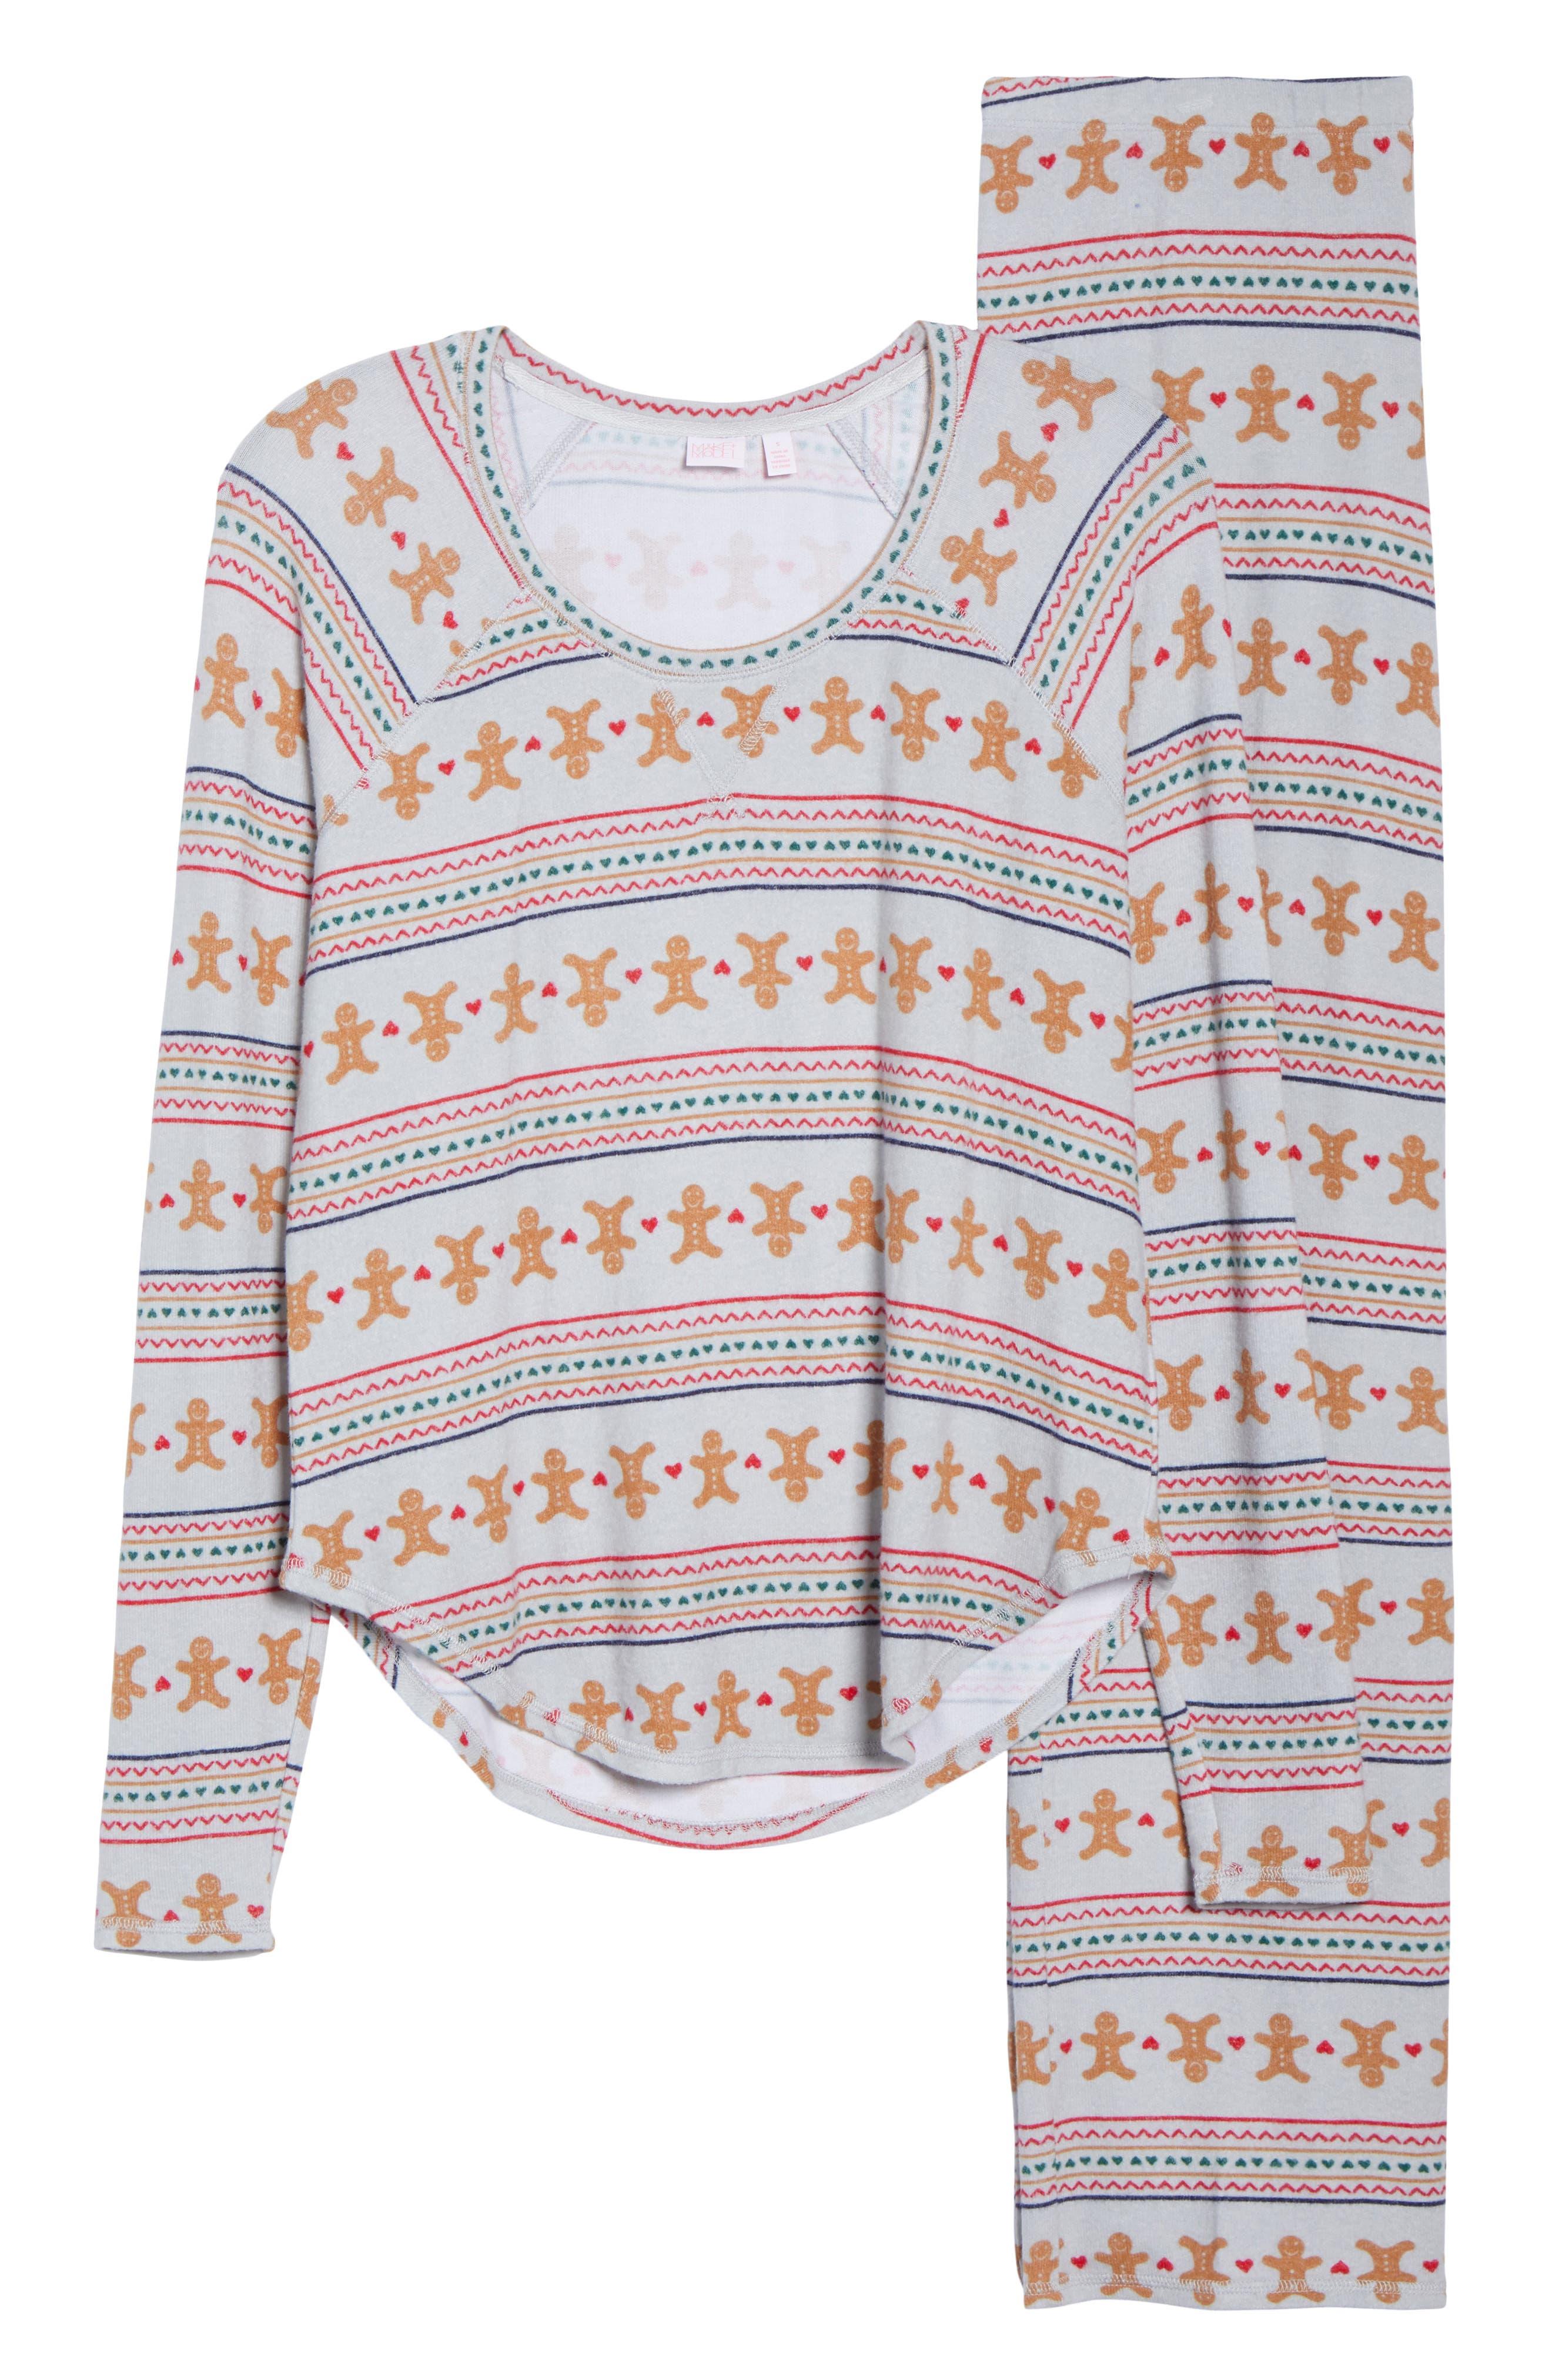 Knit Girlfriend Pajamas & Eye Mask,                             Alternate thumbnail 6, color,                             GREY MICRO GINGERBREAD